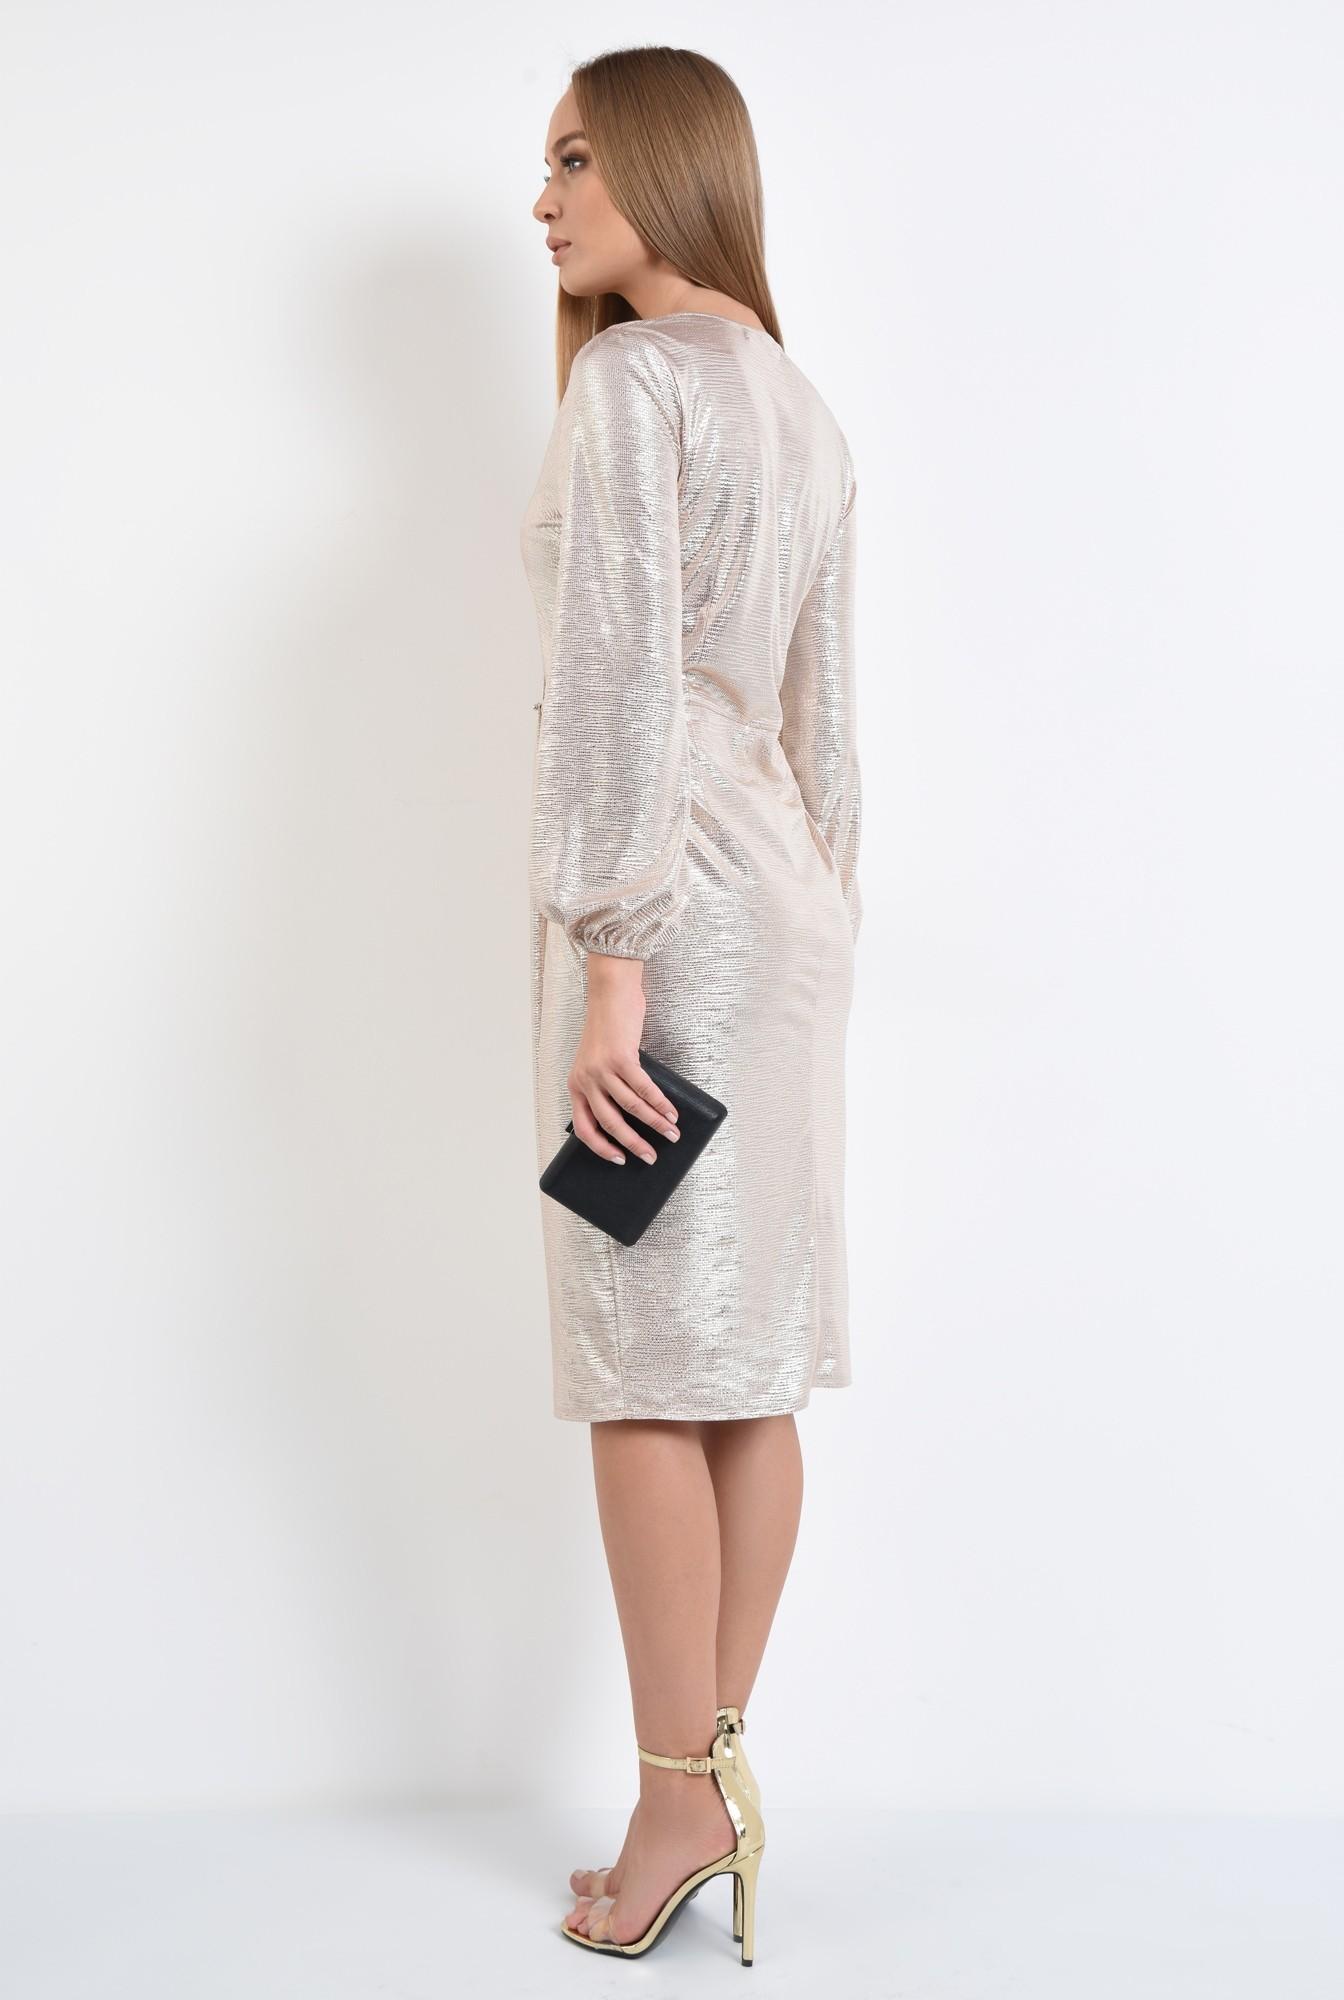 1 - rochie de ocazie, din lurex auriu, anchior, parte peste parte